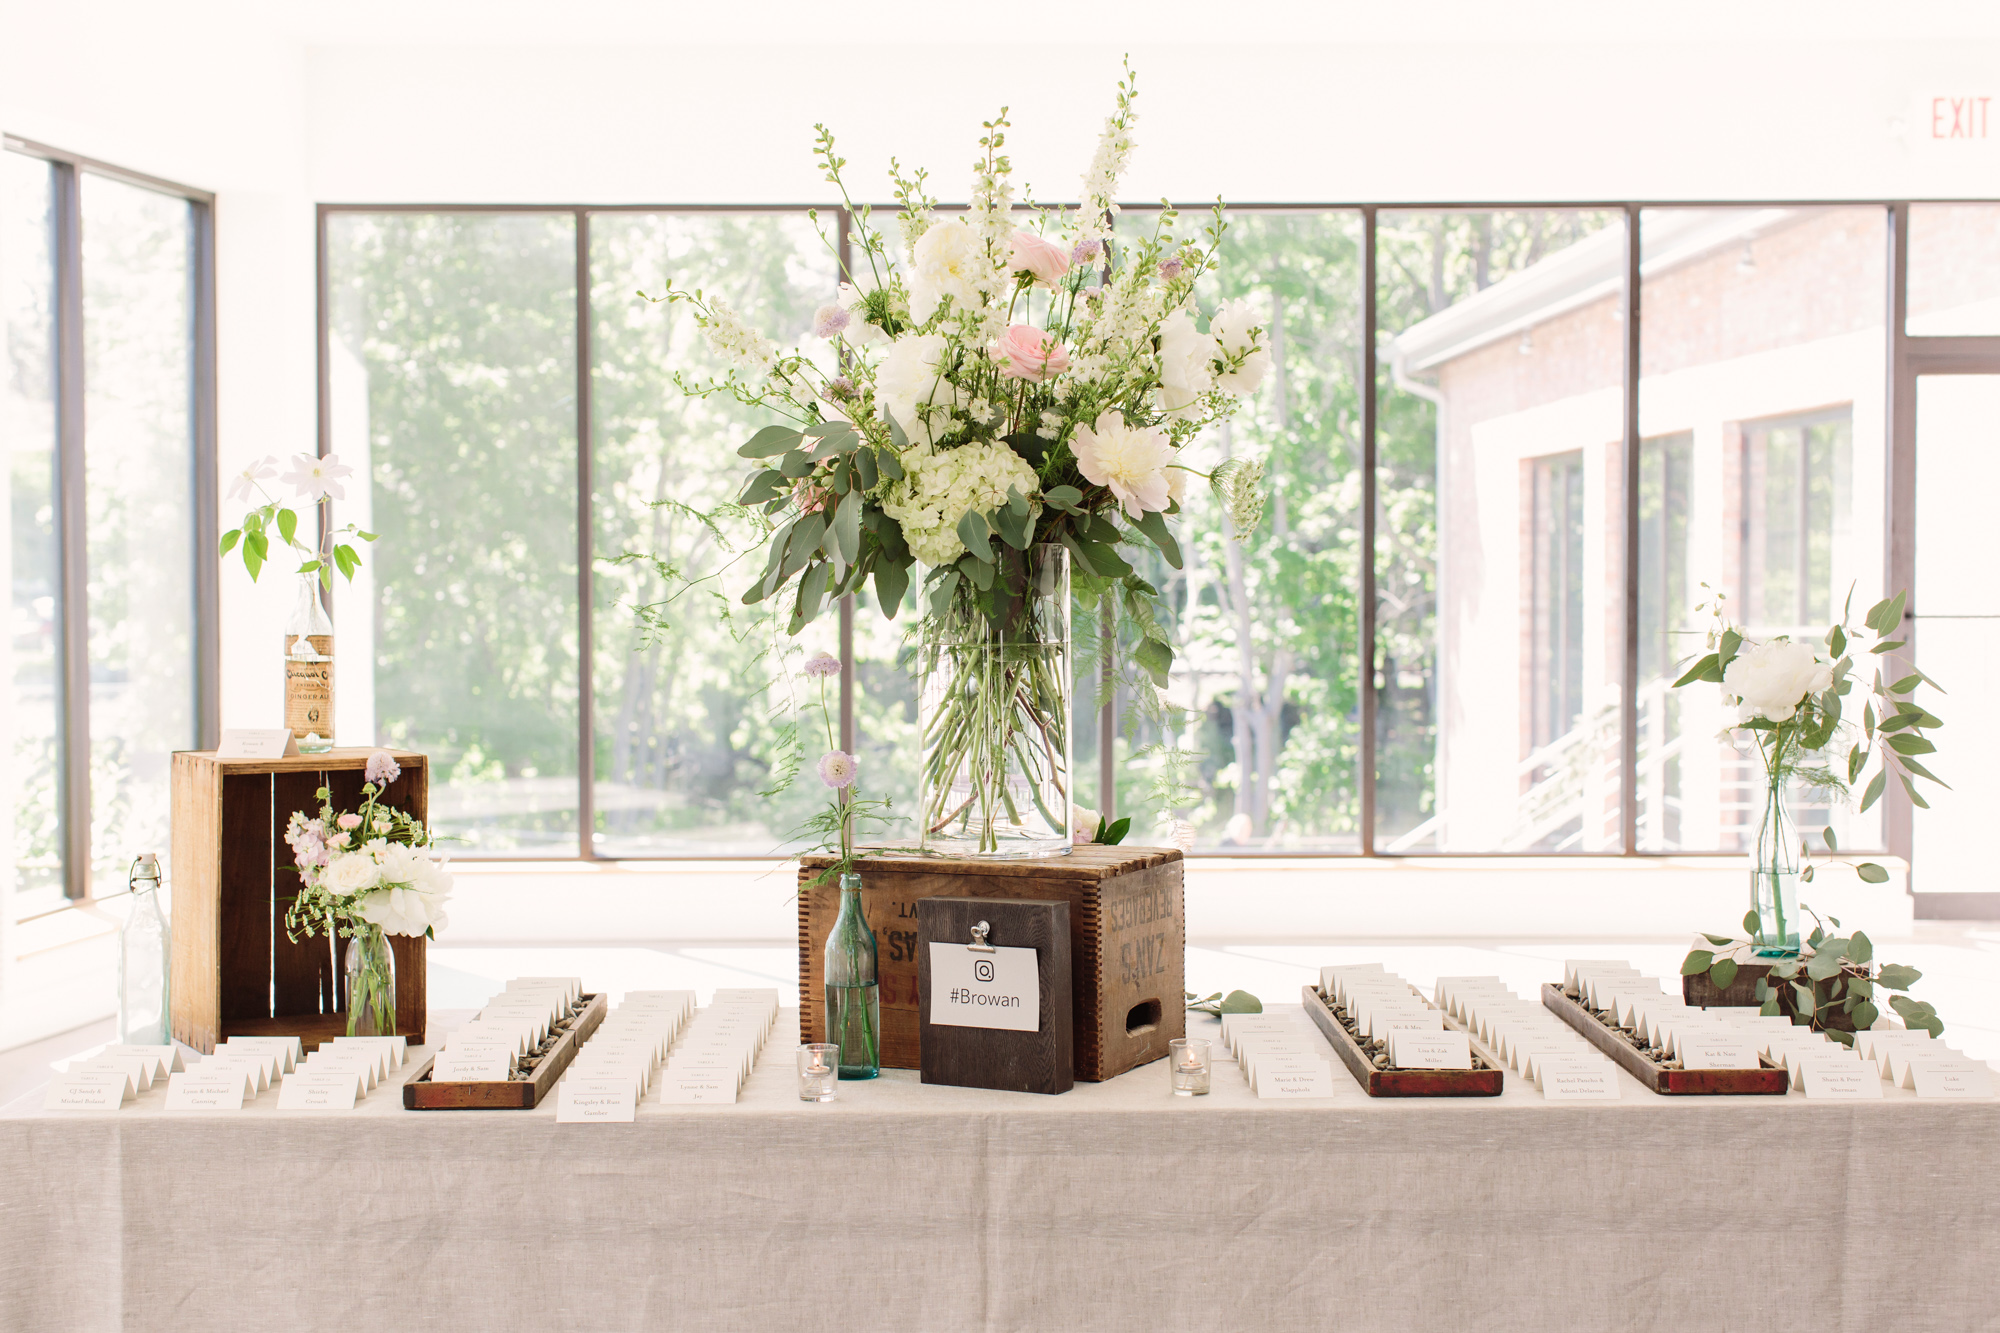 55_Rowan_Brian_The_Roundhouse_Wedding_Beacon_NY_Tanya_Salazar_Photography_1084.jpg